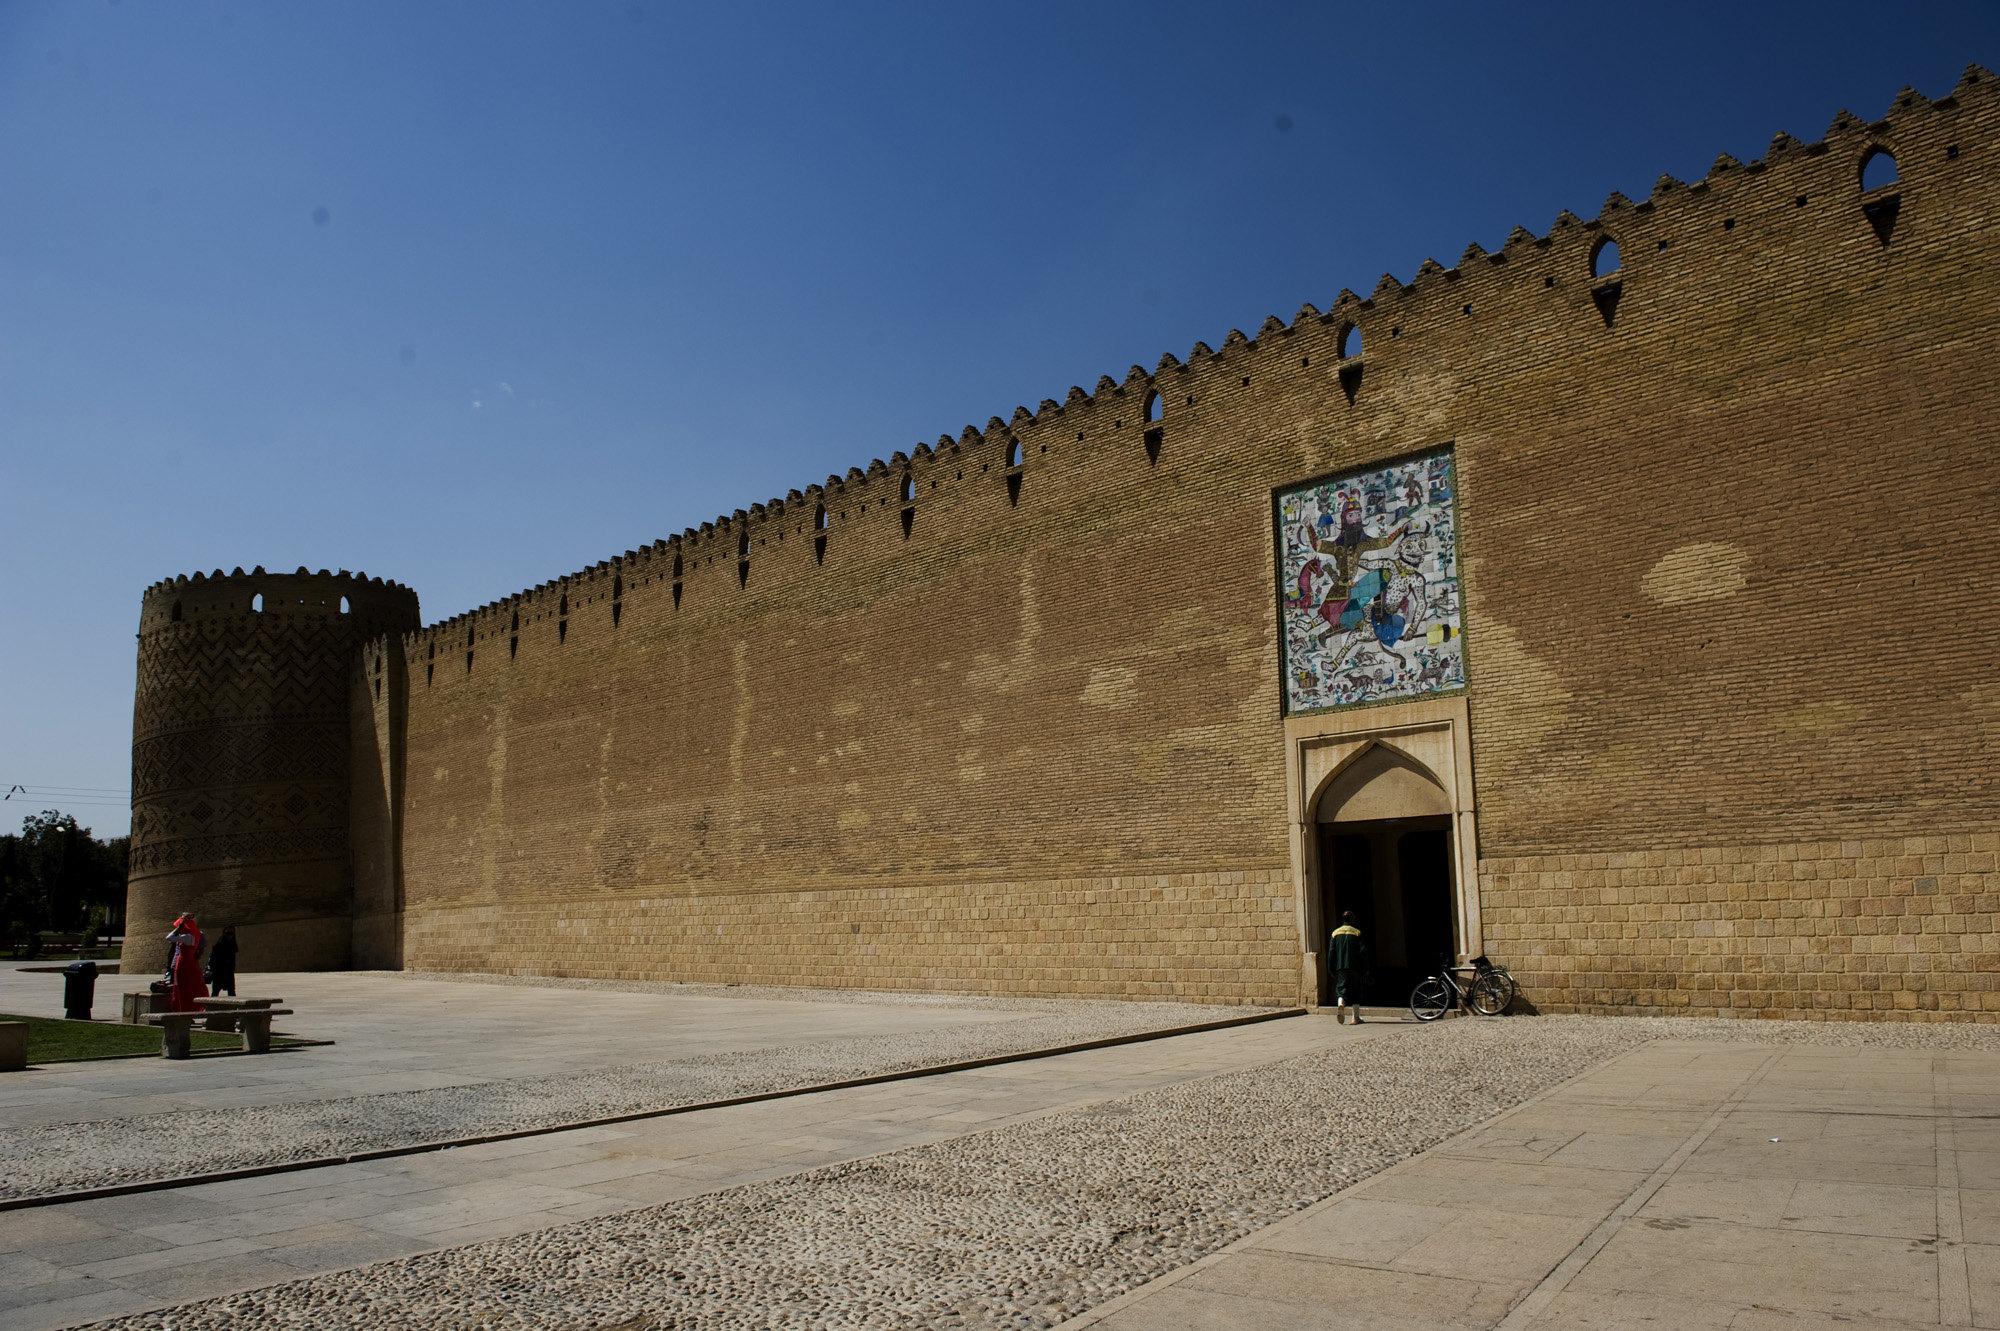 卡里姆汗古城堡  Citadel of Karim Khan   -0